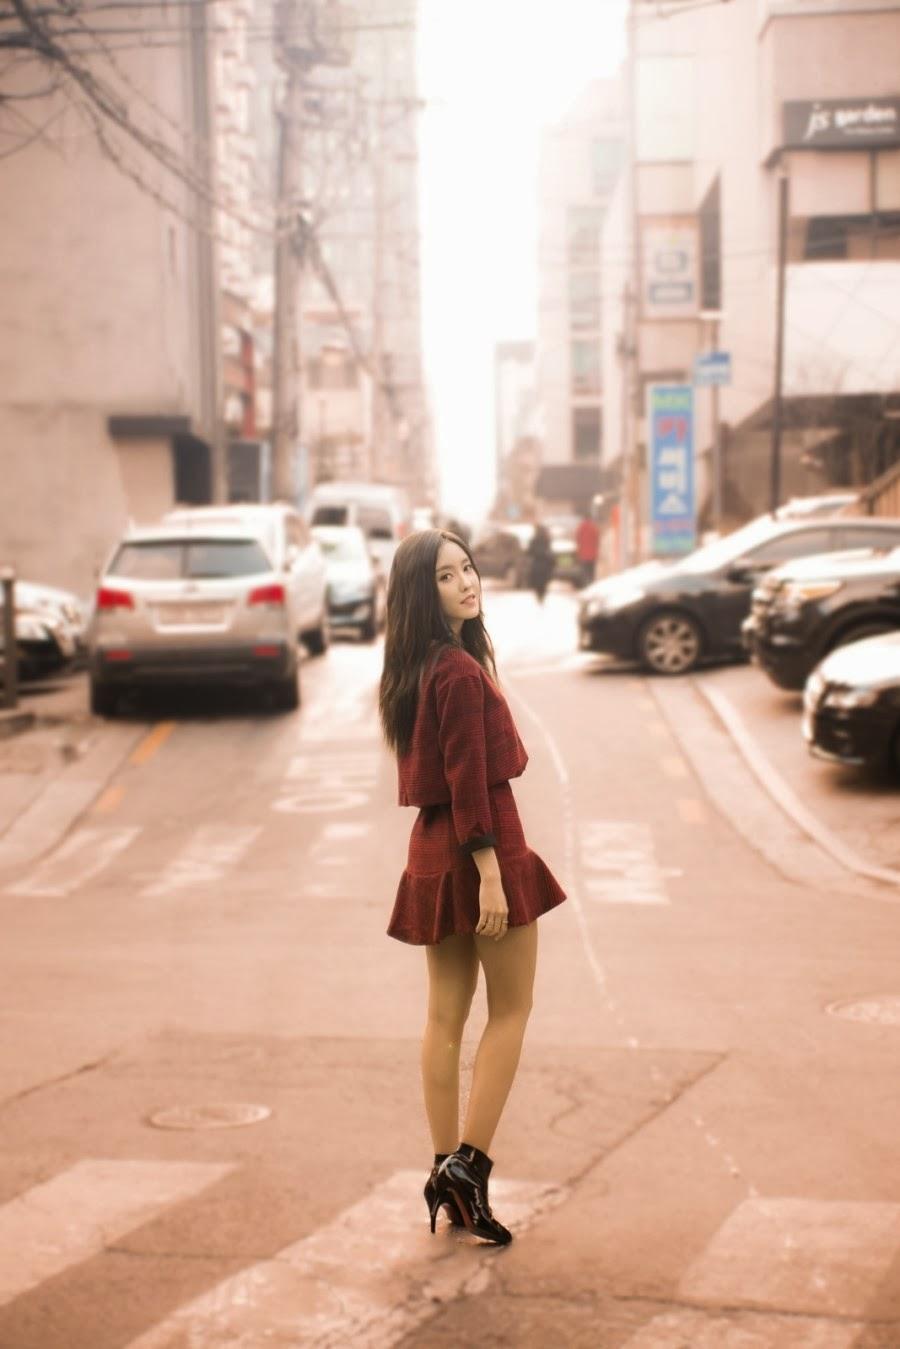 Hyomin - Casually Beautiful